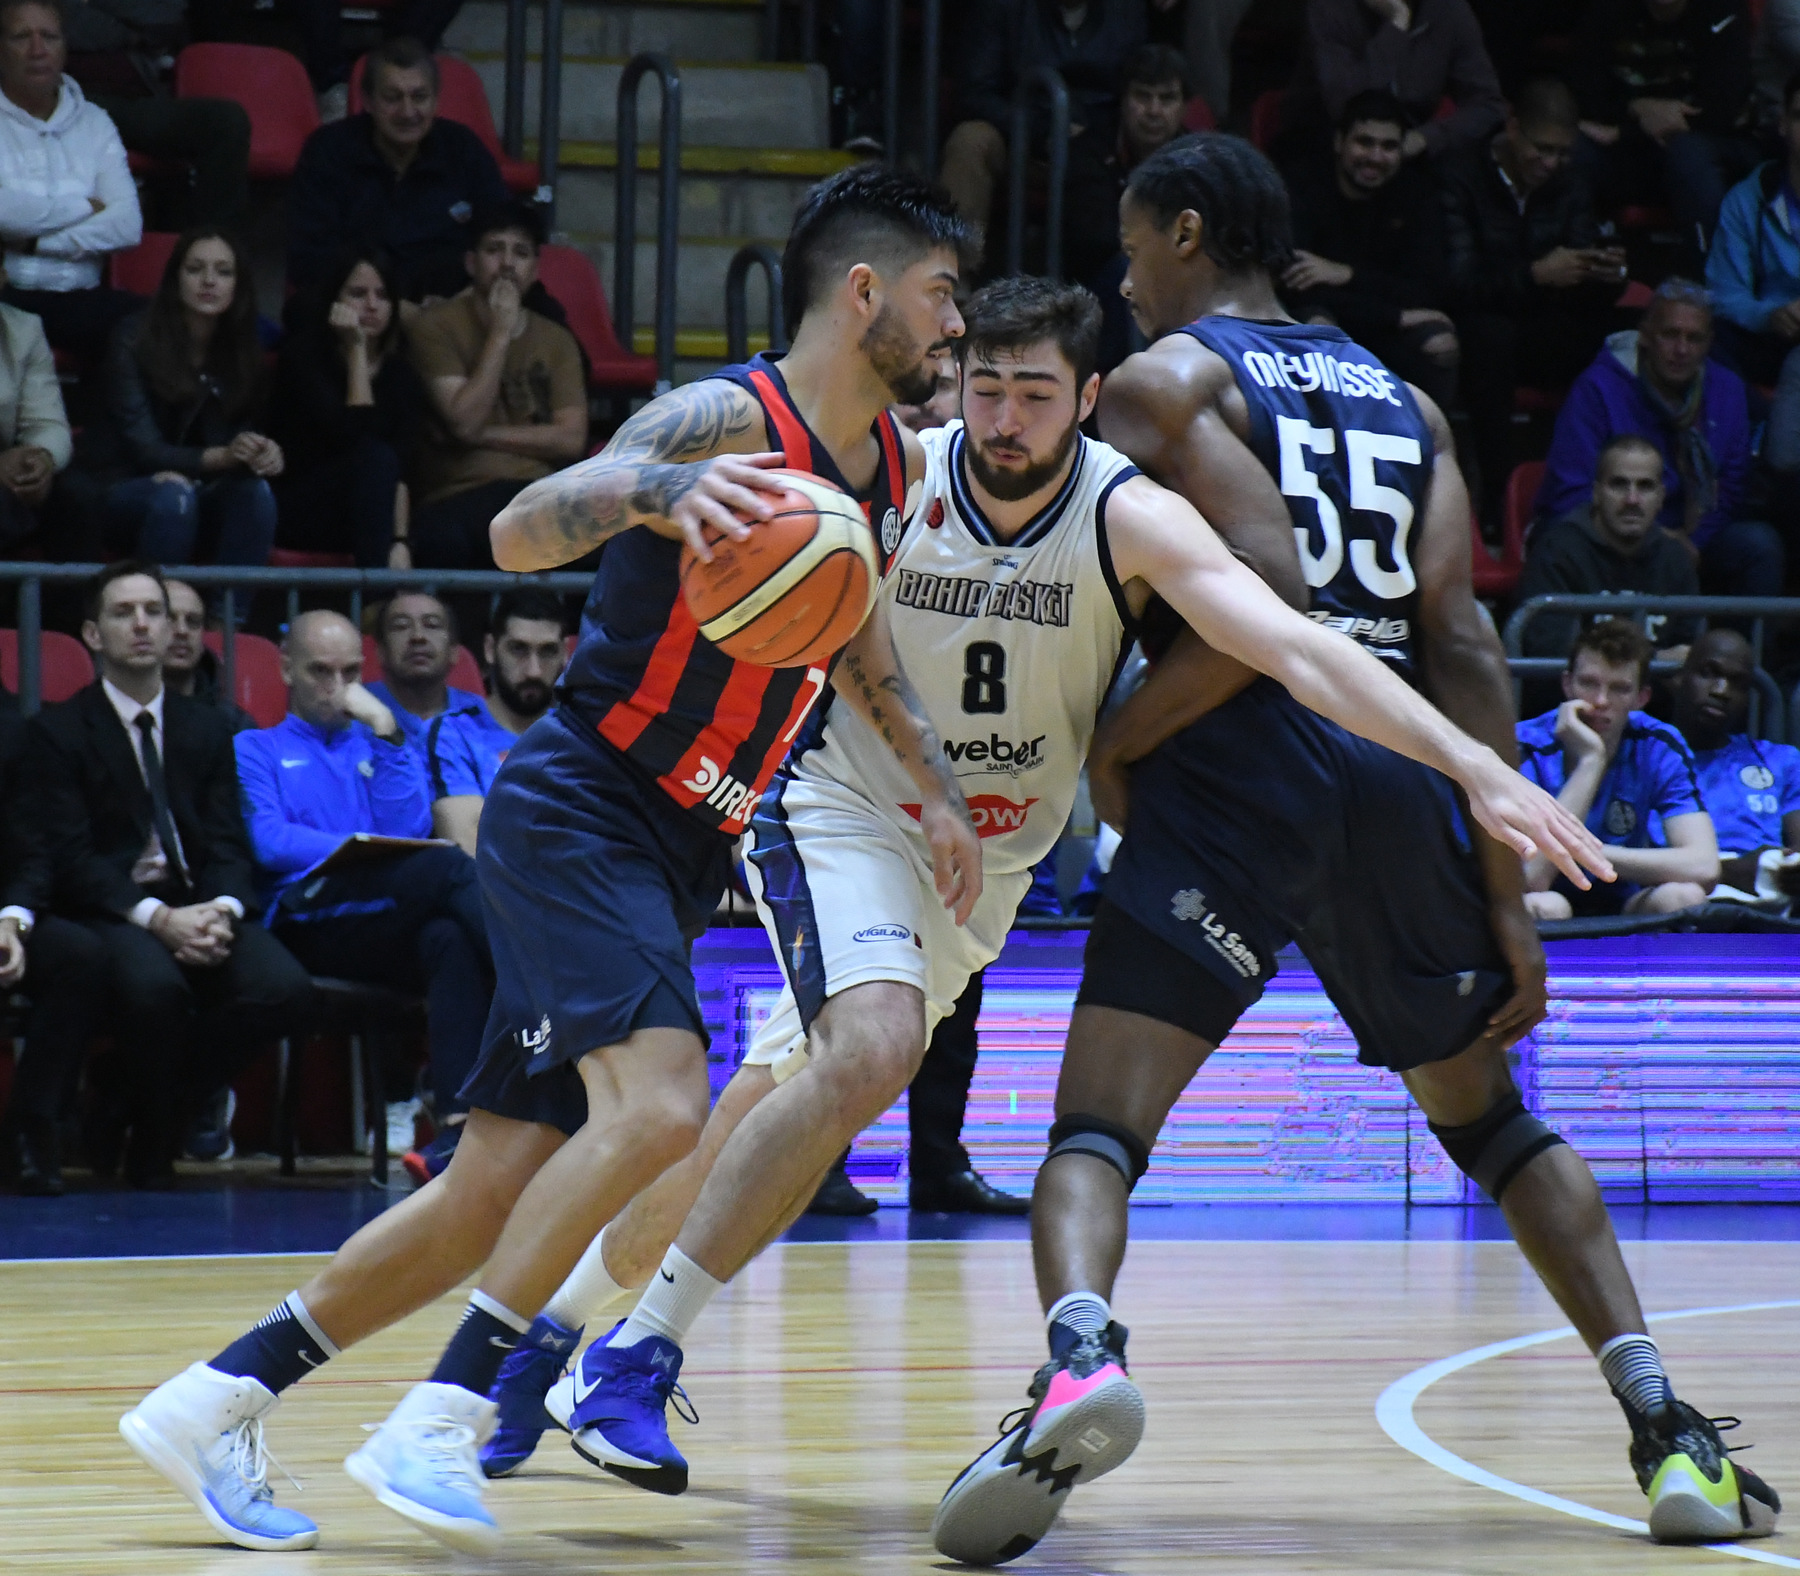 Resultado de imagen para san lorenzo 110 bahia basket 76